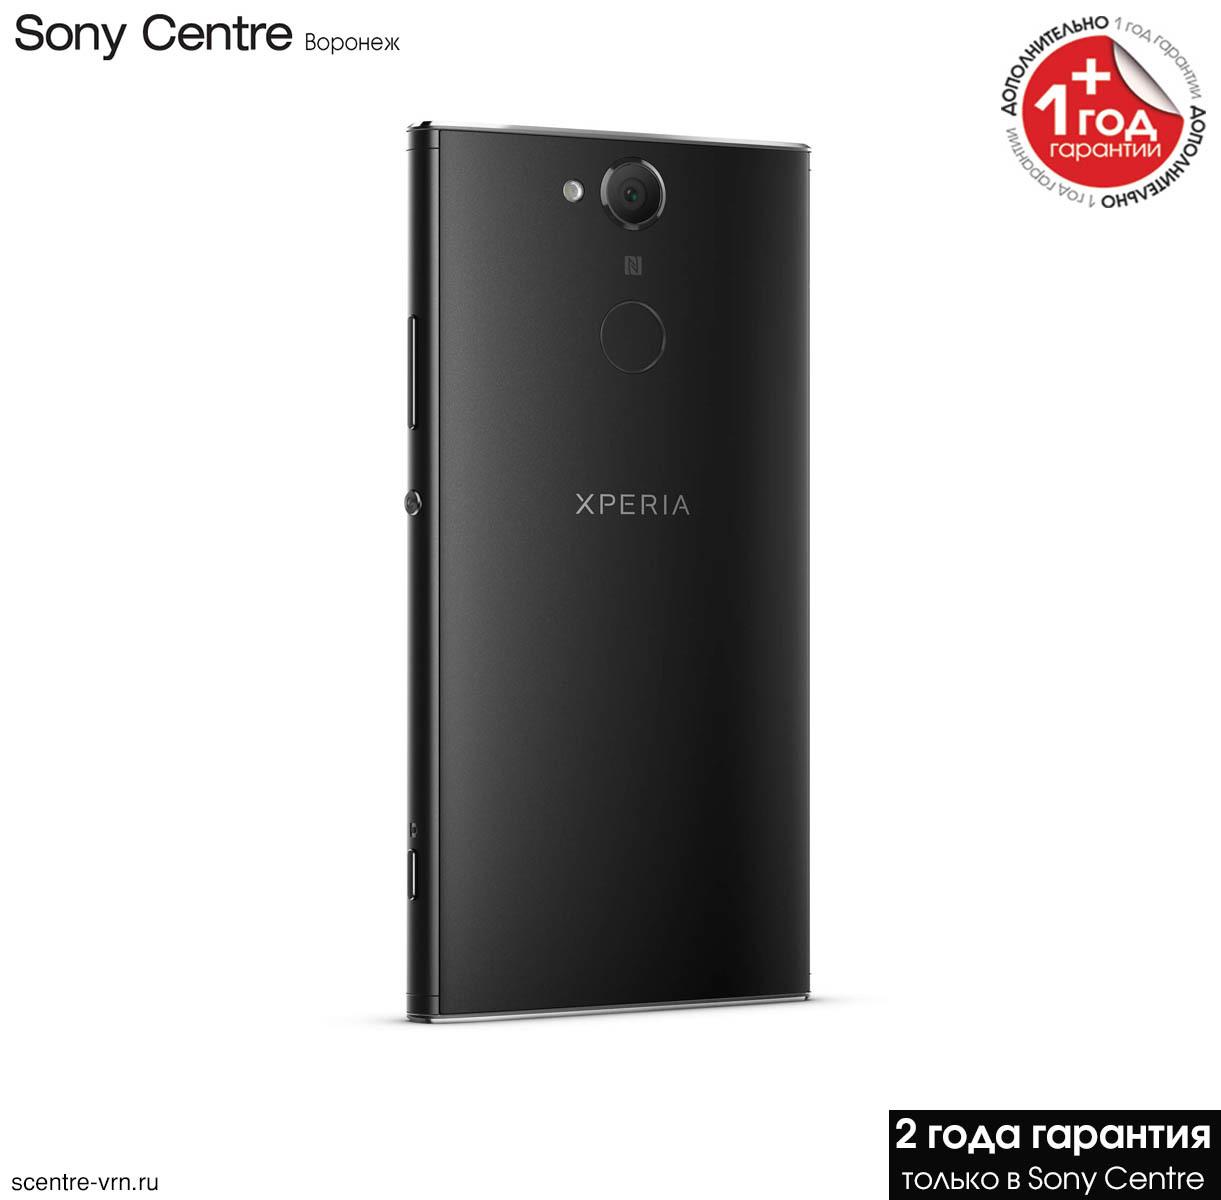 H4213/B смартфон Sony Xperia XA2 Ultra, цвет черный